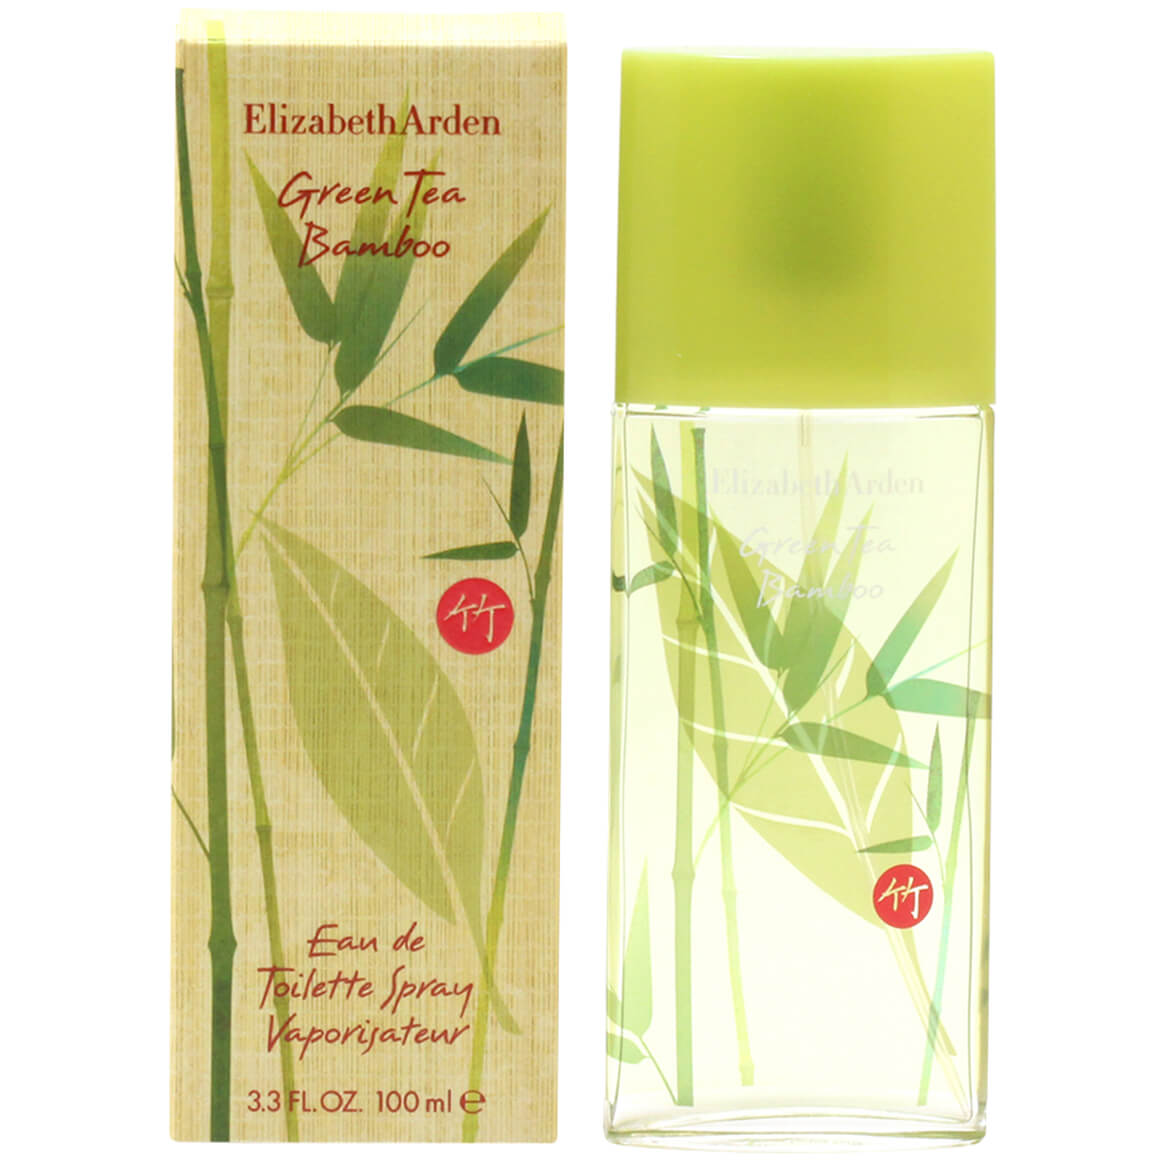 Elizabeth Arden Green Tea Bamboo for Women EDT, 3.3 oz.-366836